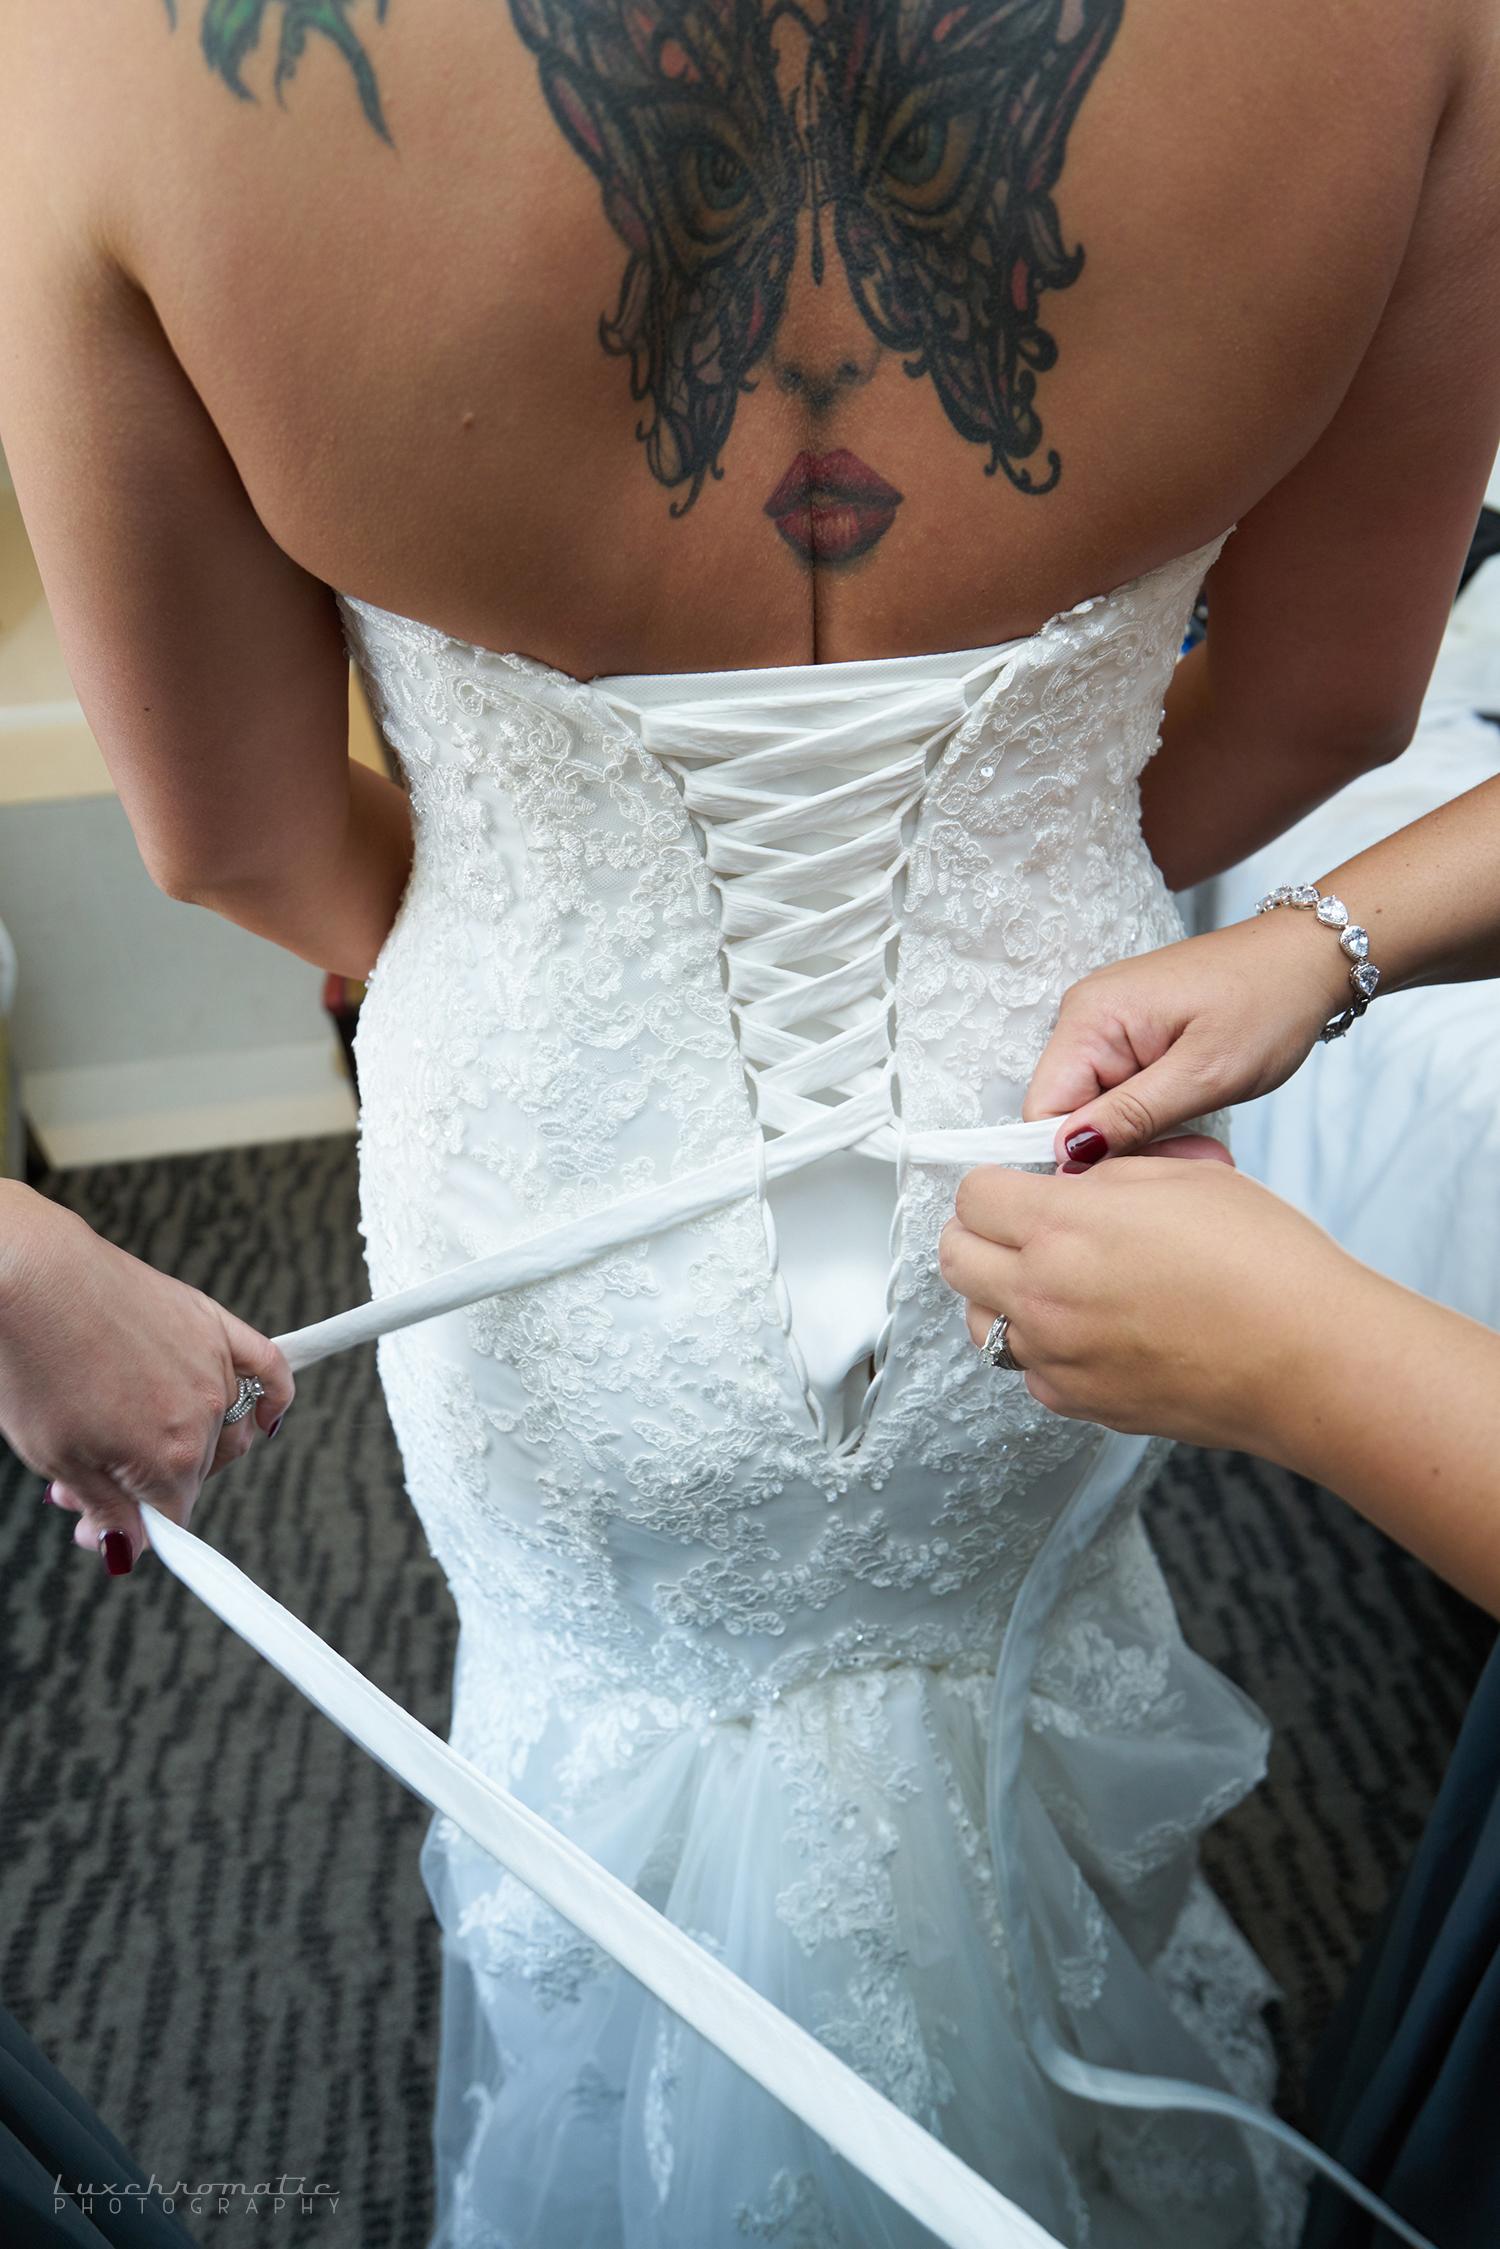 081217_Rachel_Chris_a0107-weddingdress-bride-weddingphotography-weddingphotographer-bridal-groom-wedding-engagementring-proposal-brides-diamondring-sonyalpha-sony-sonya9-sonya7rii-sanfrancisco-sf-bayarea-photographer-profoto-murrietas-well.jpg